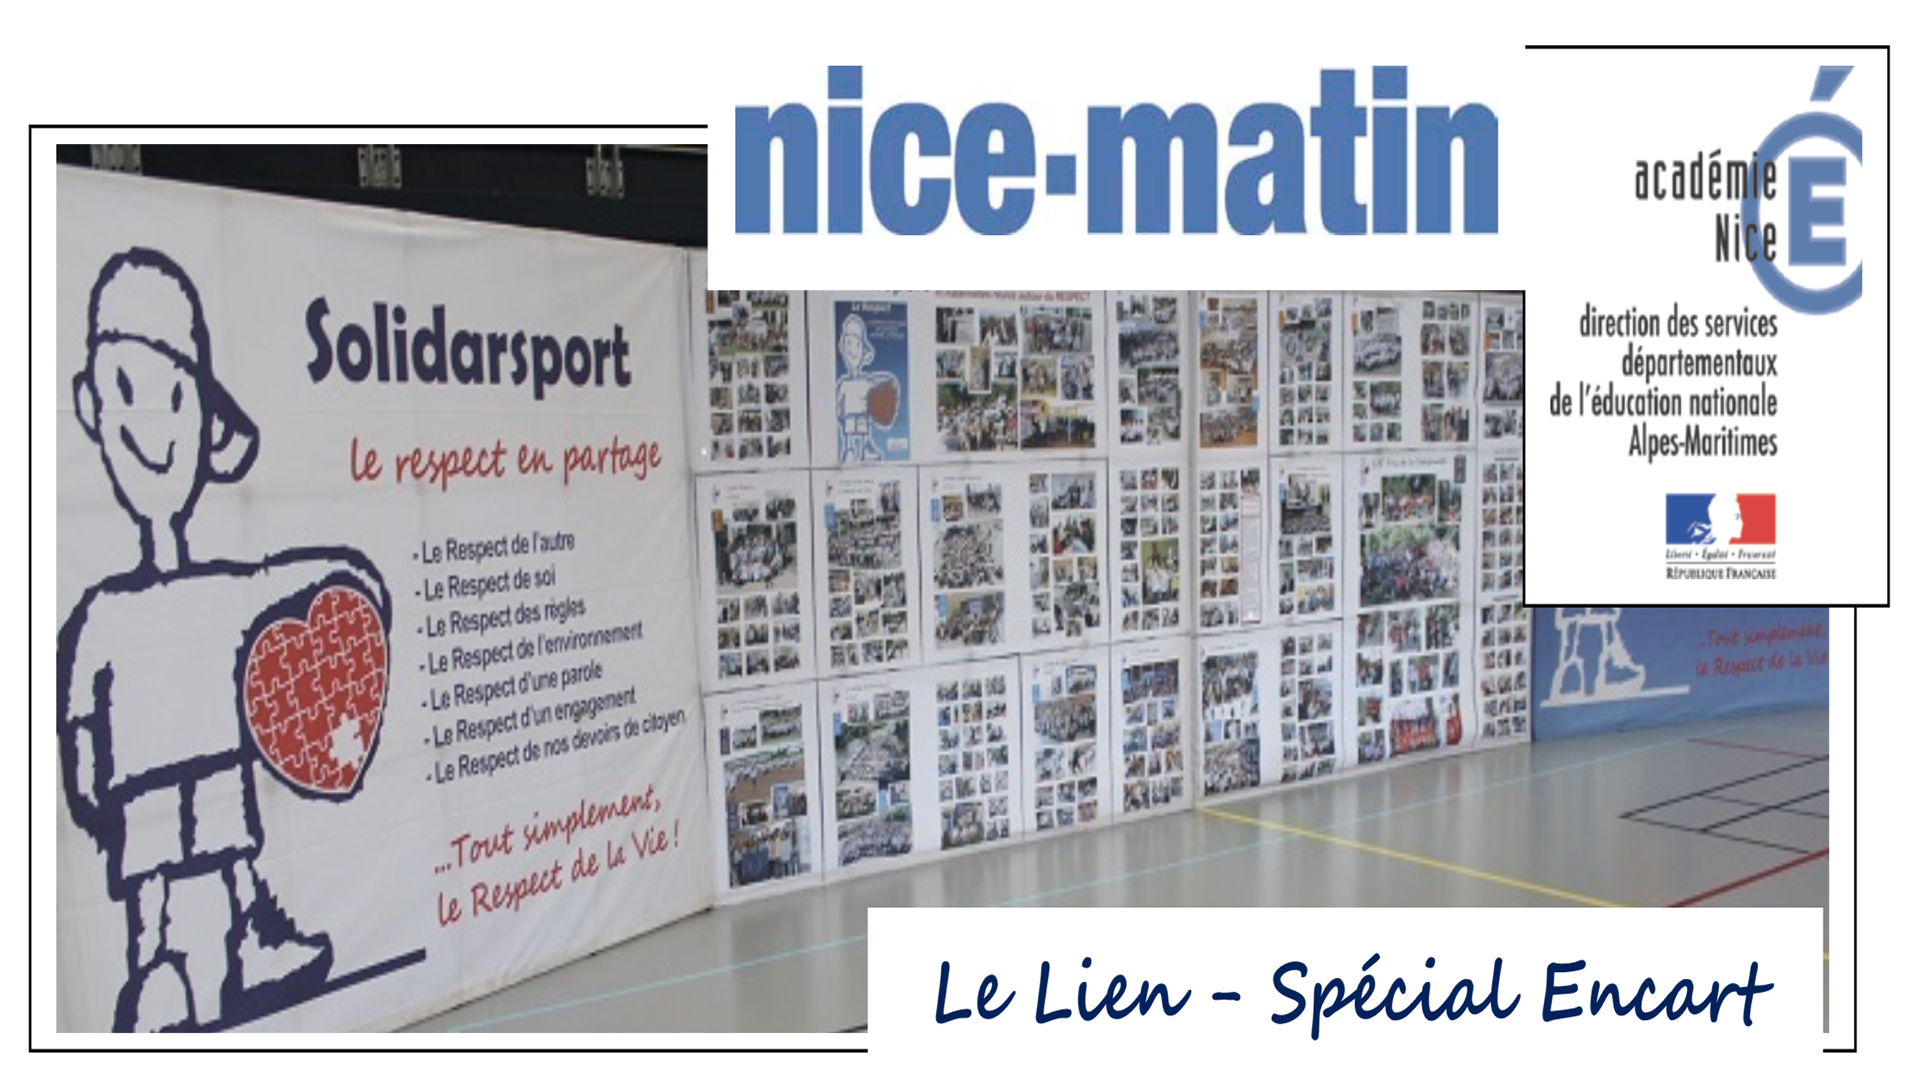 Un Encart Spécial dans Nice-Matin